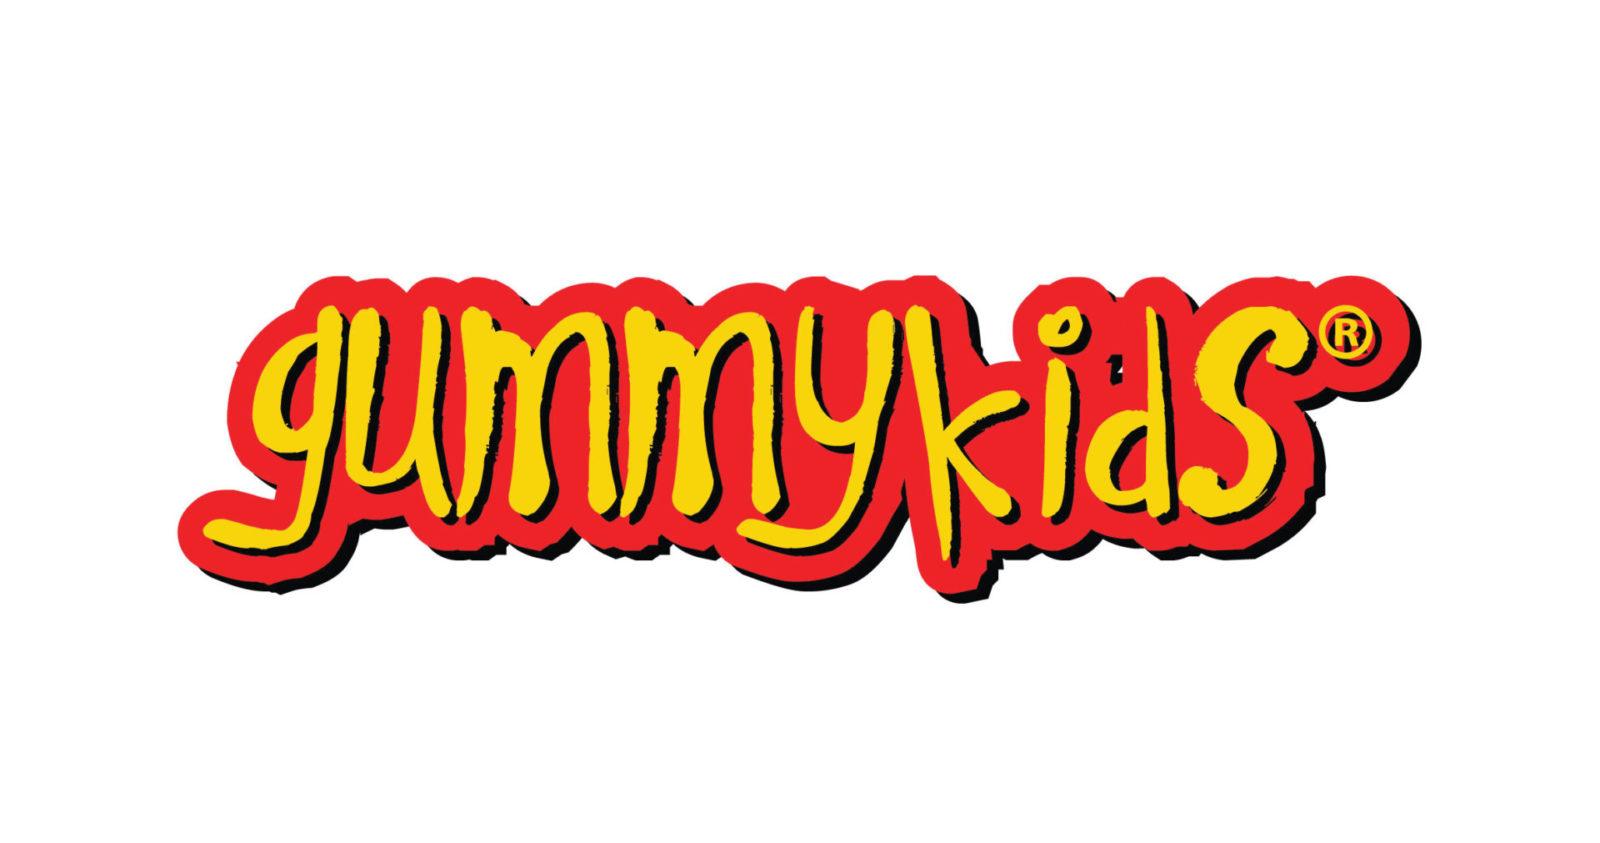 Alpro Pharmacy Oneclick Gummy Kids